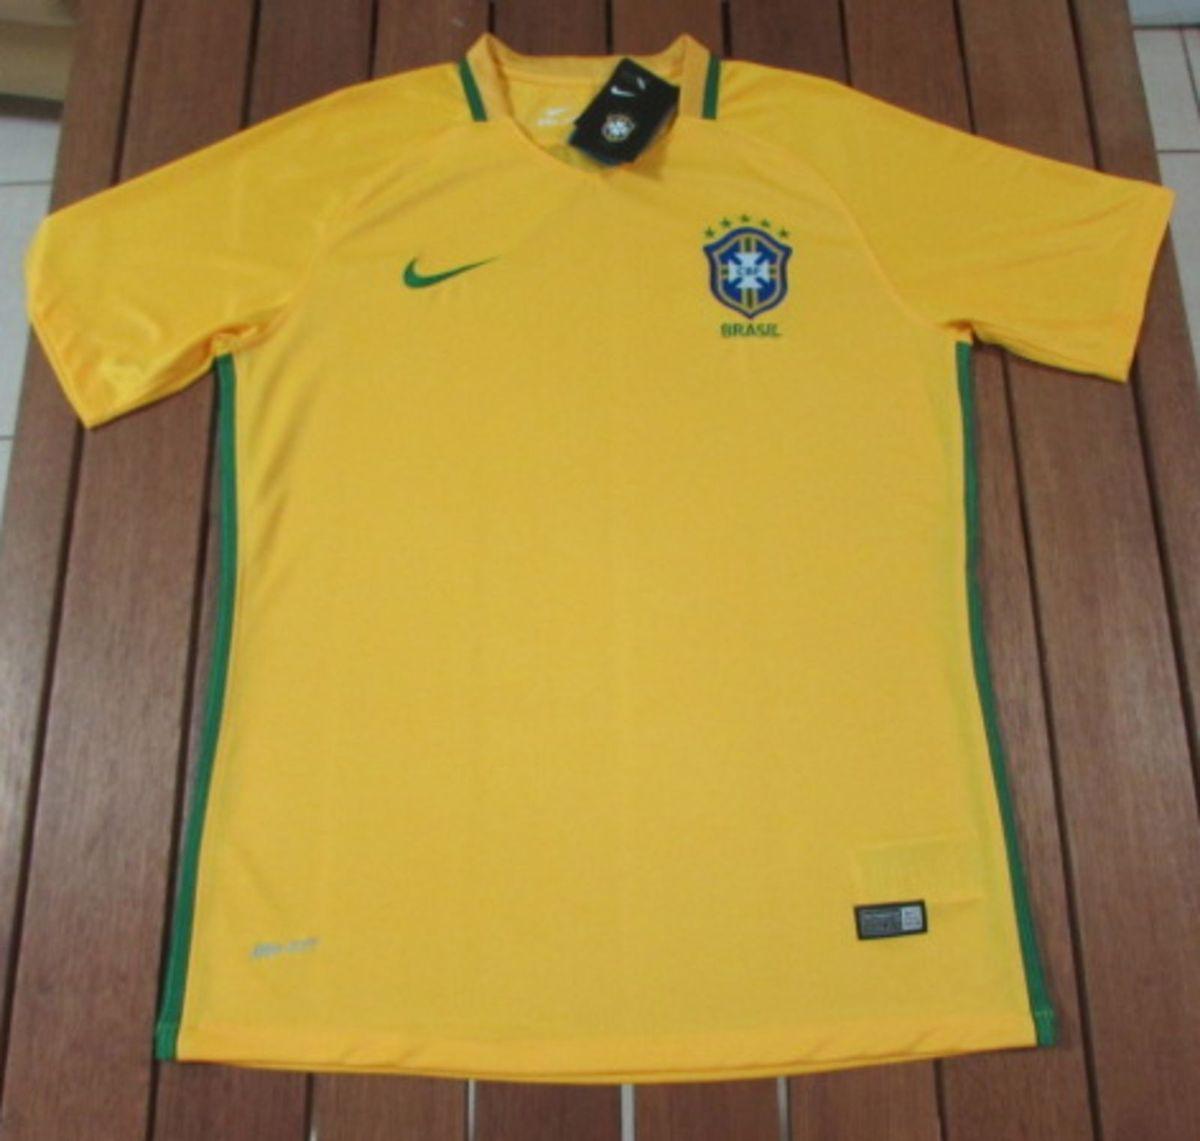 camisa brasil 16 17 versão torcedor - esportes nike 32b208afda0a9